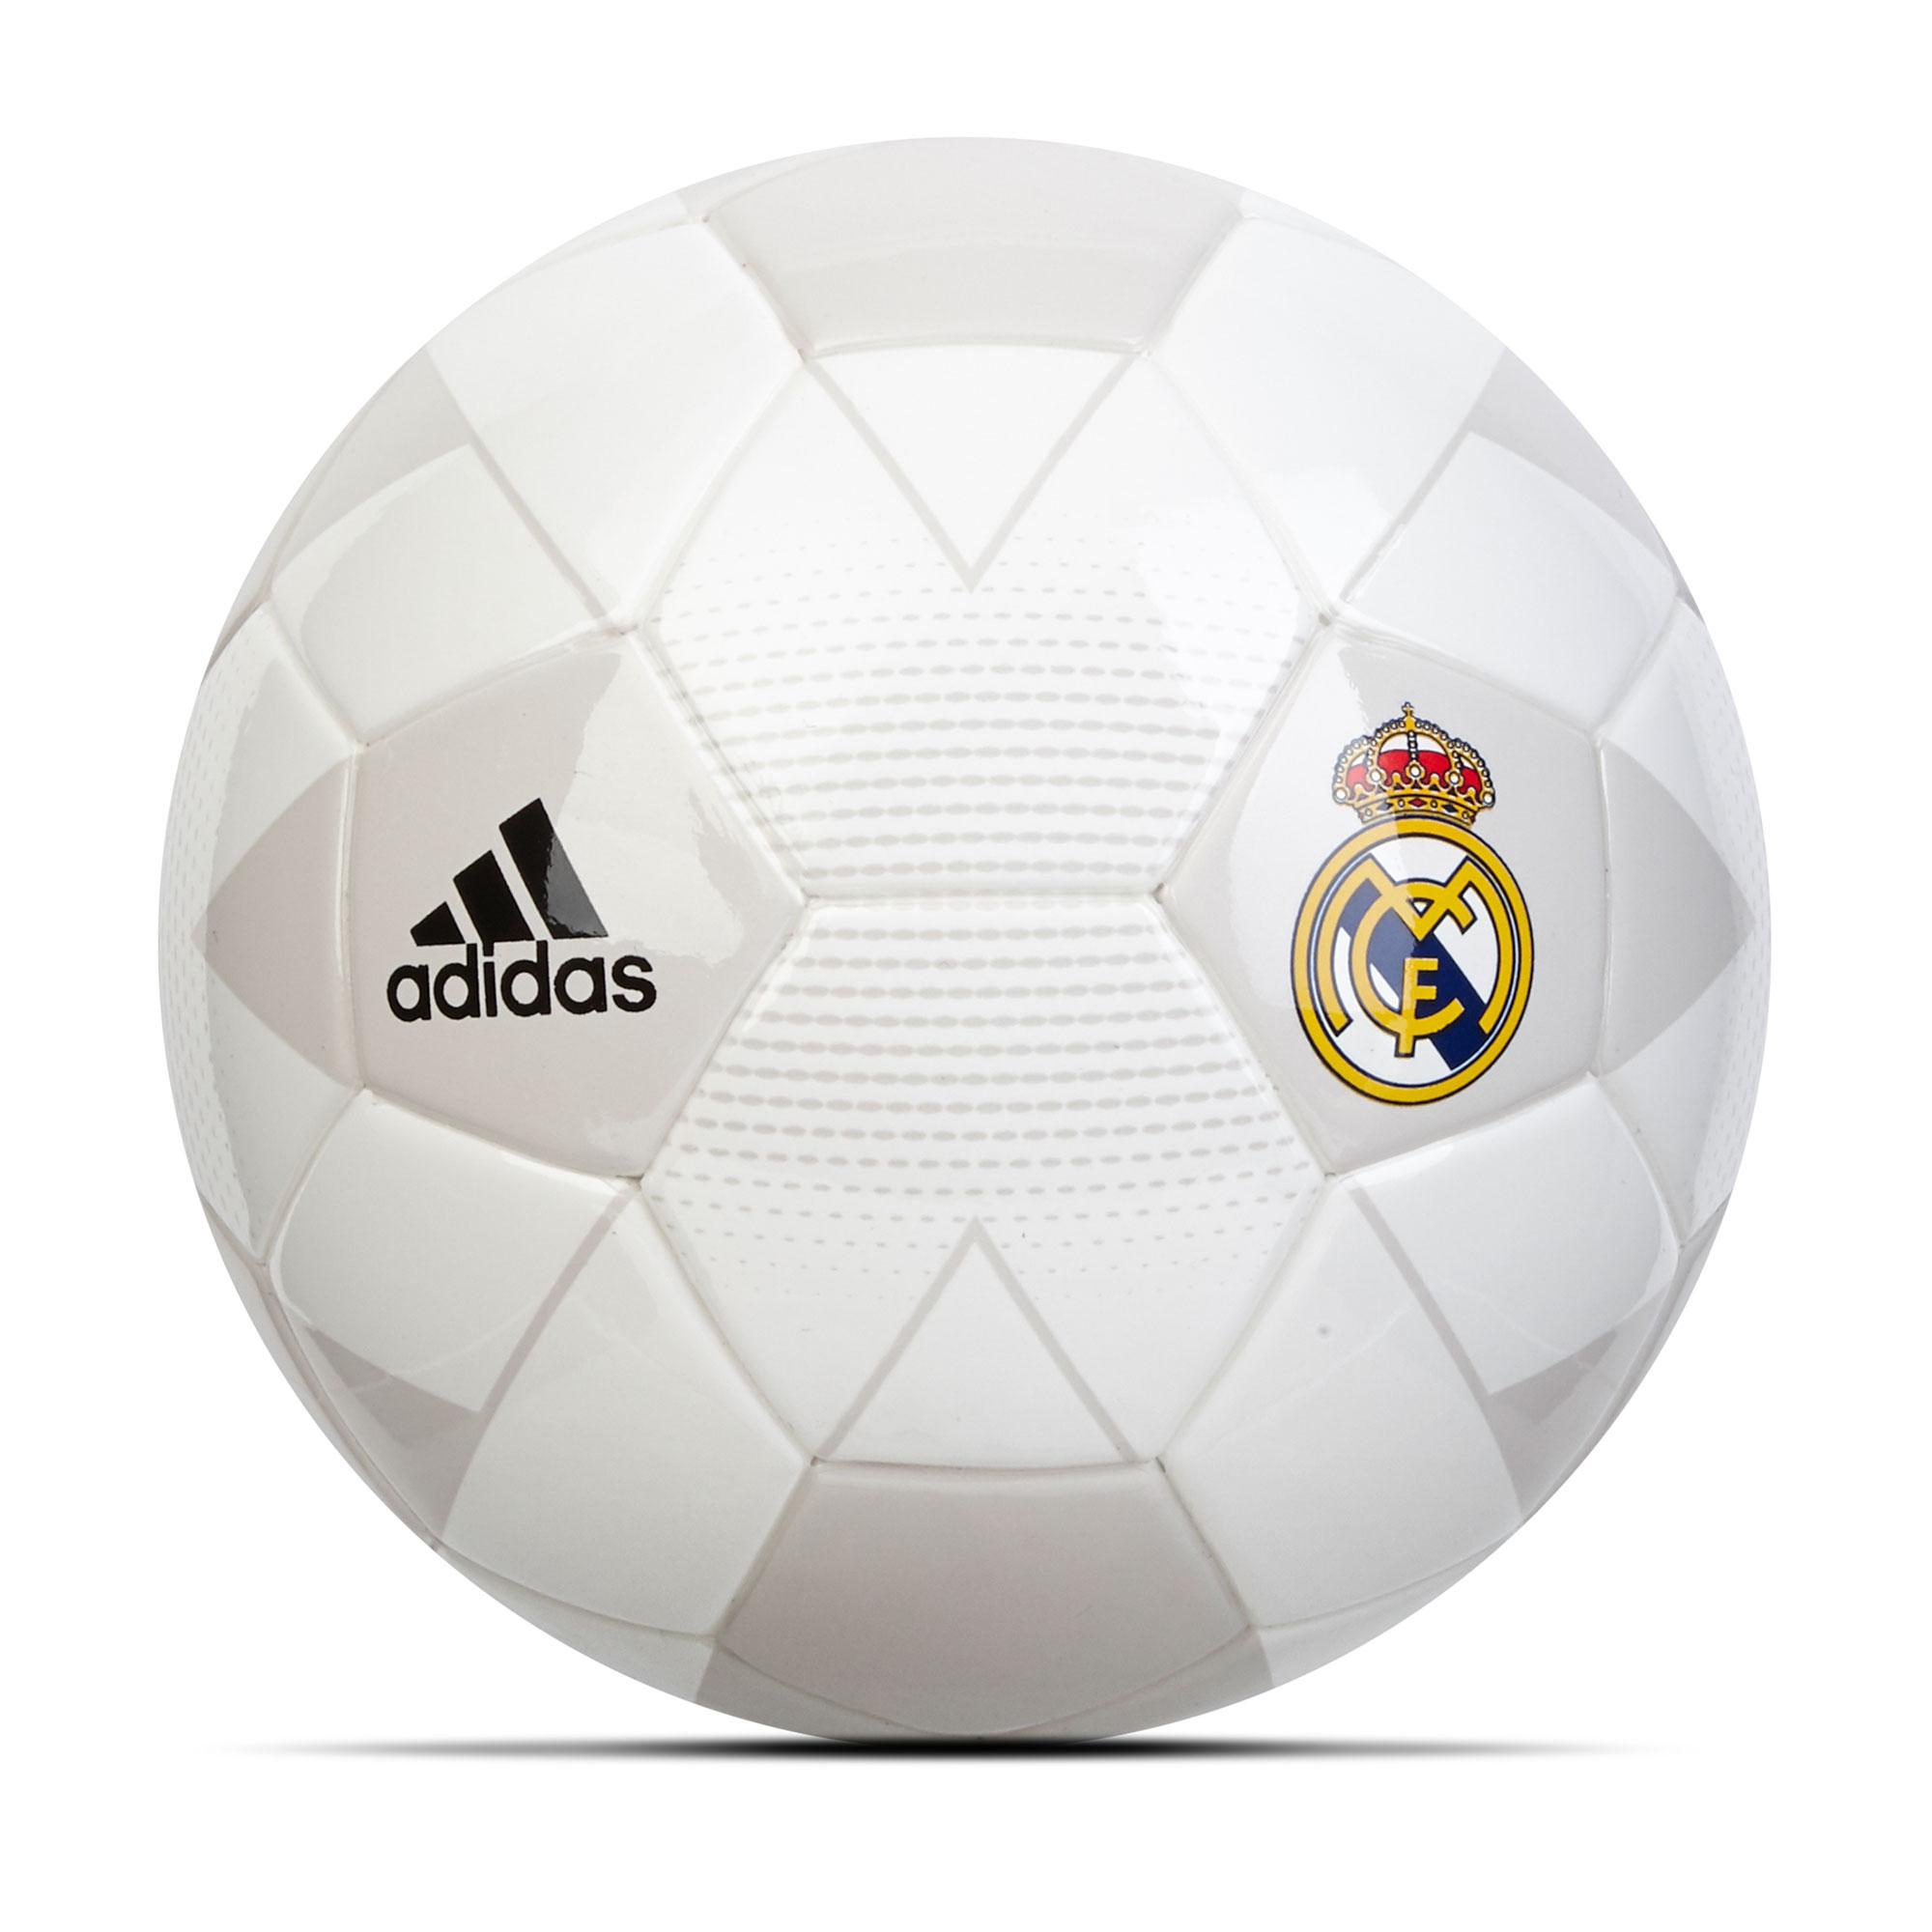 Minibalón de fútbol Real Madrid — Tamaño 1 — Blanco